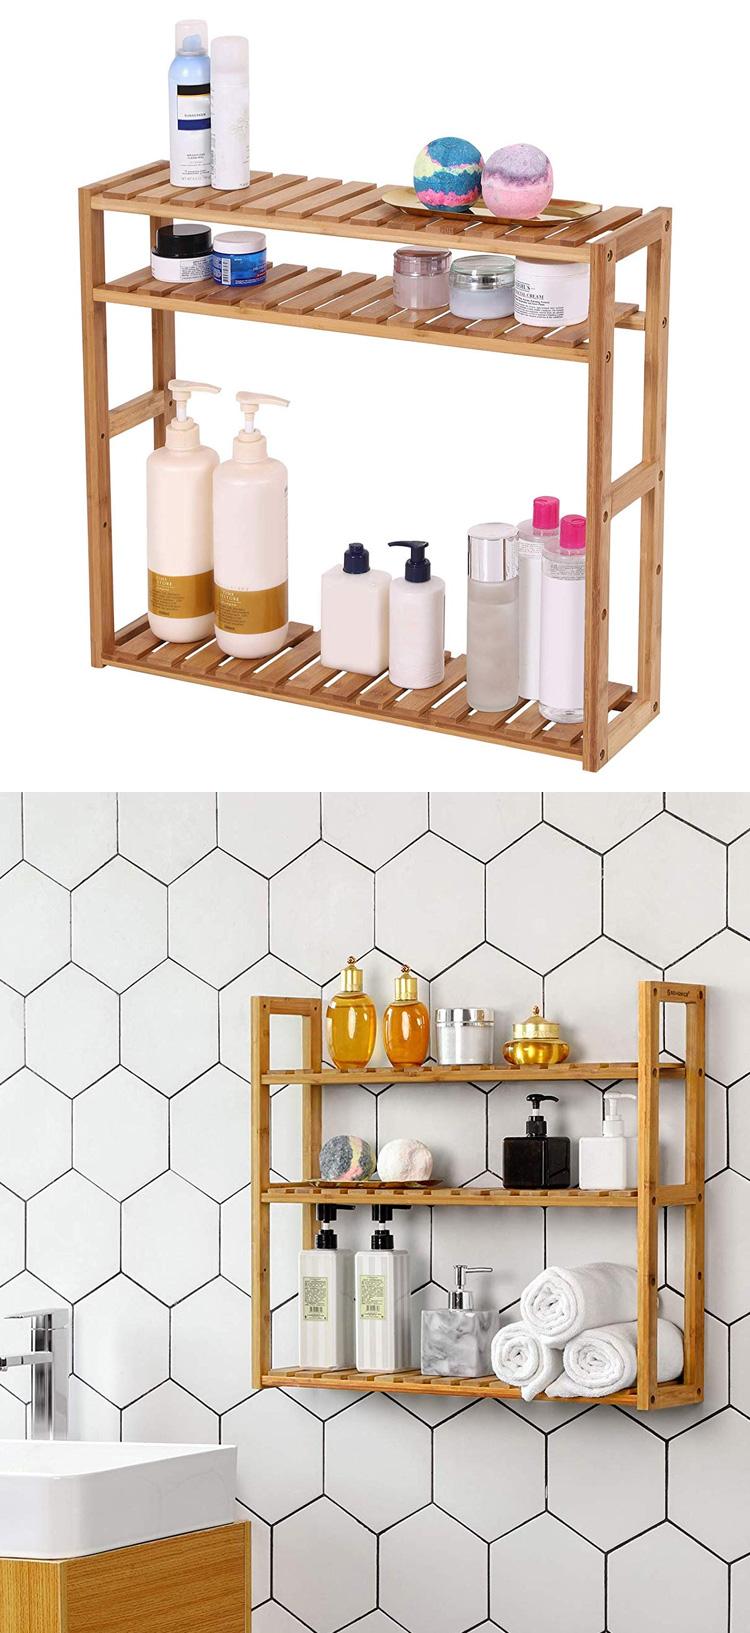 Utility Storage Bamboo 3-Tier Adjustable Layer Wall Mounted Organizer Towel Shelf For Bathroom 3